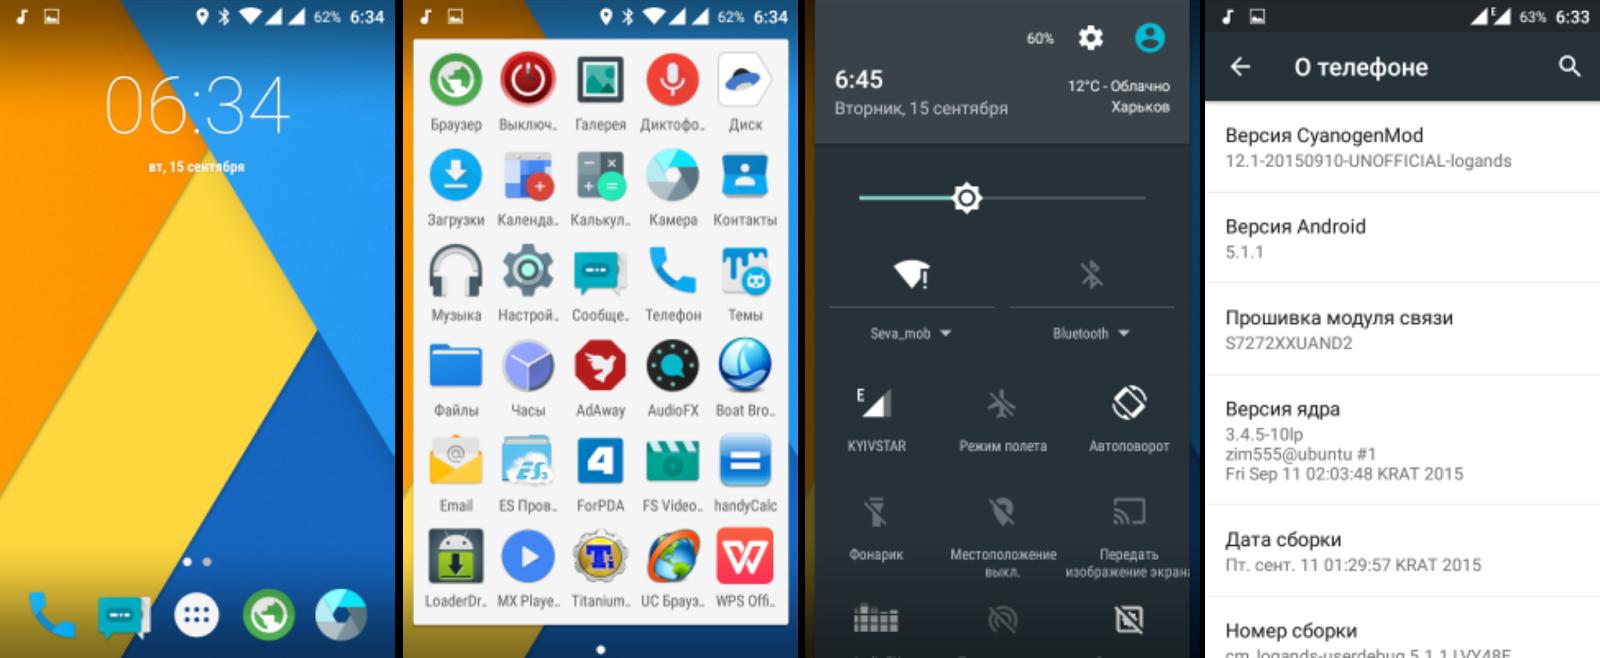 Cara Meribah Samsung Ace 3 S7270 Menjadi Android Lolipop ...